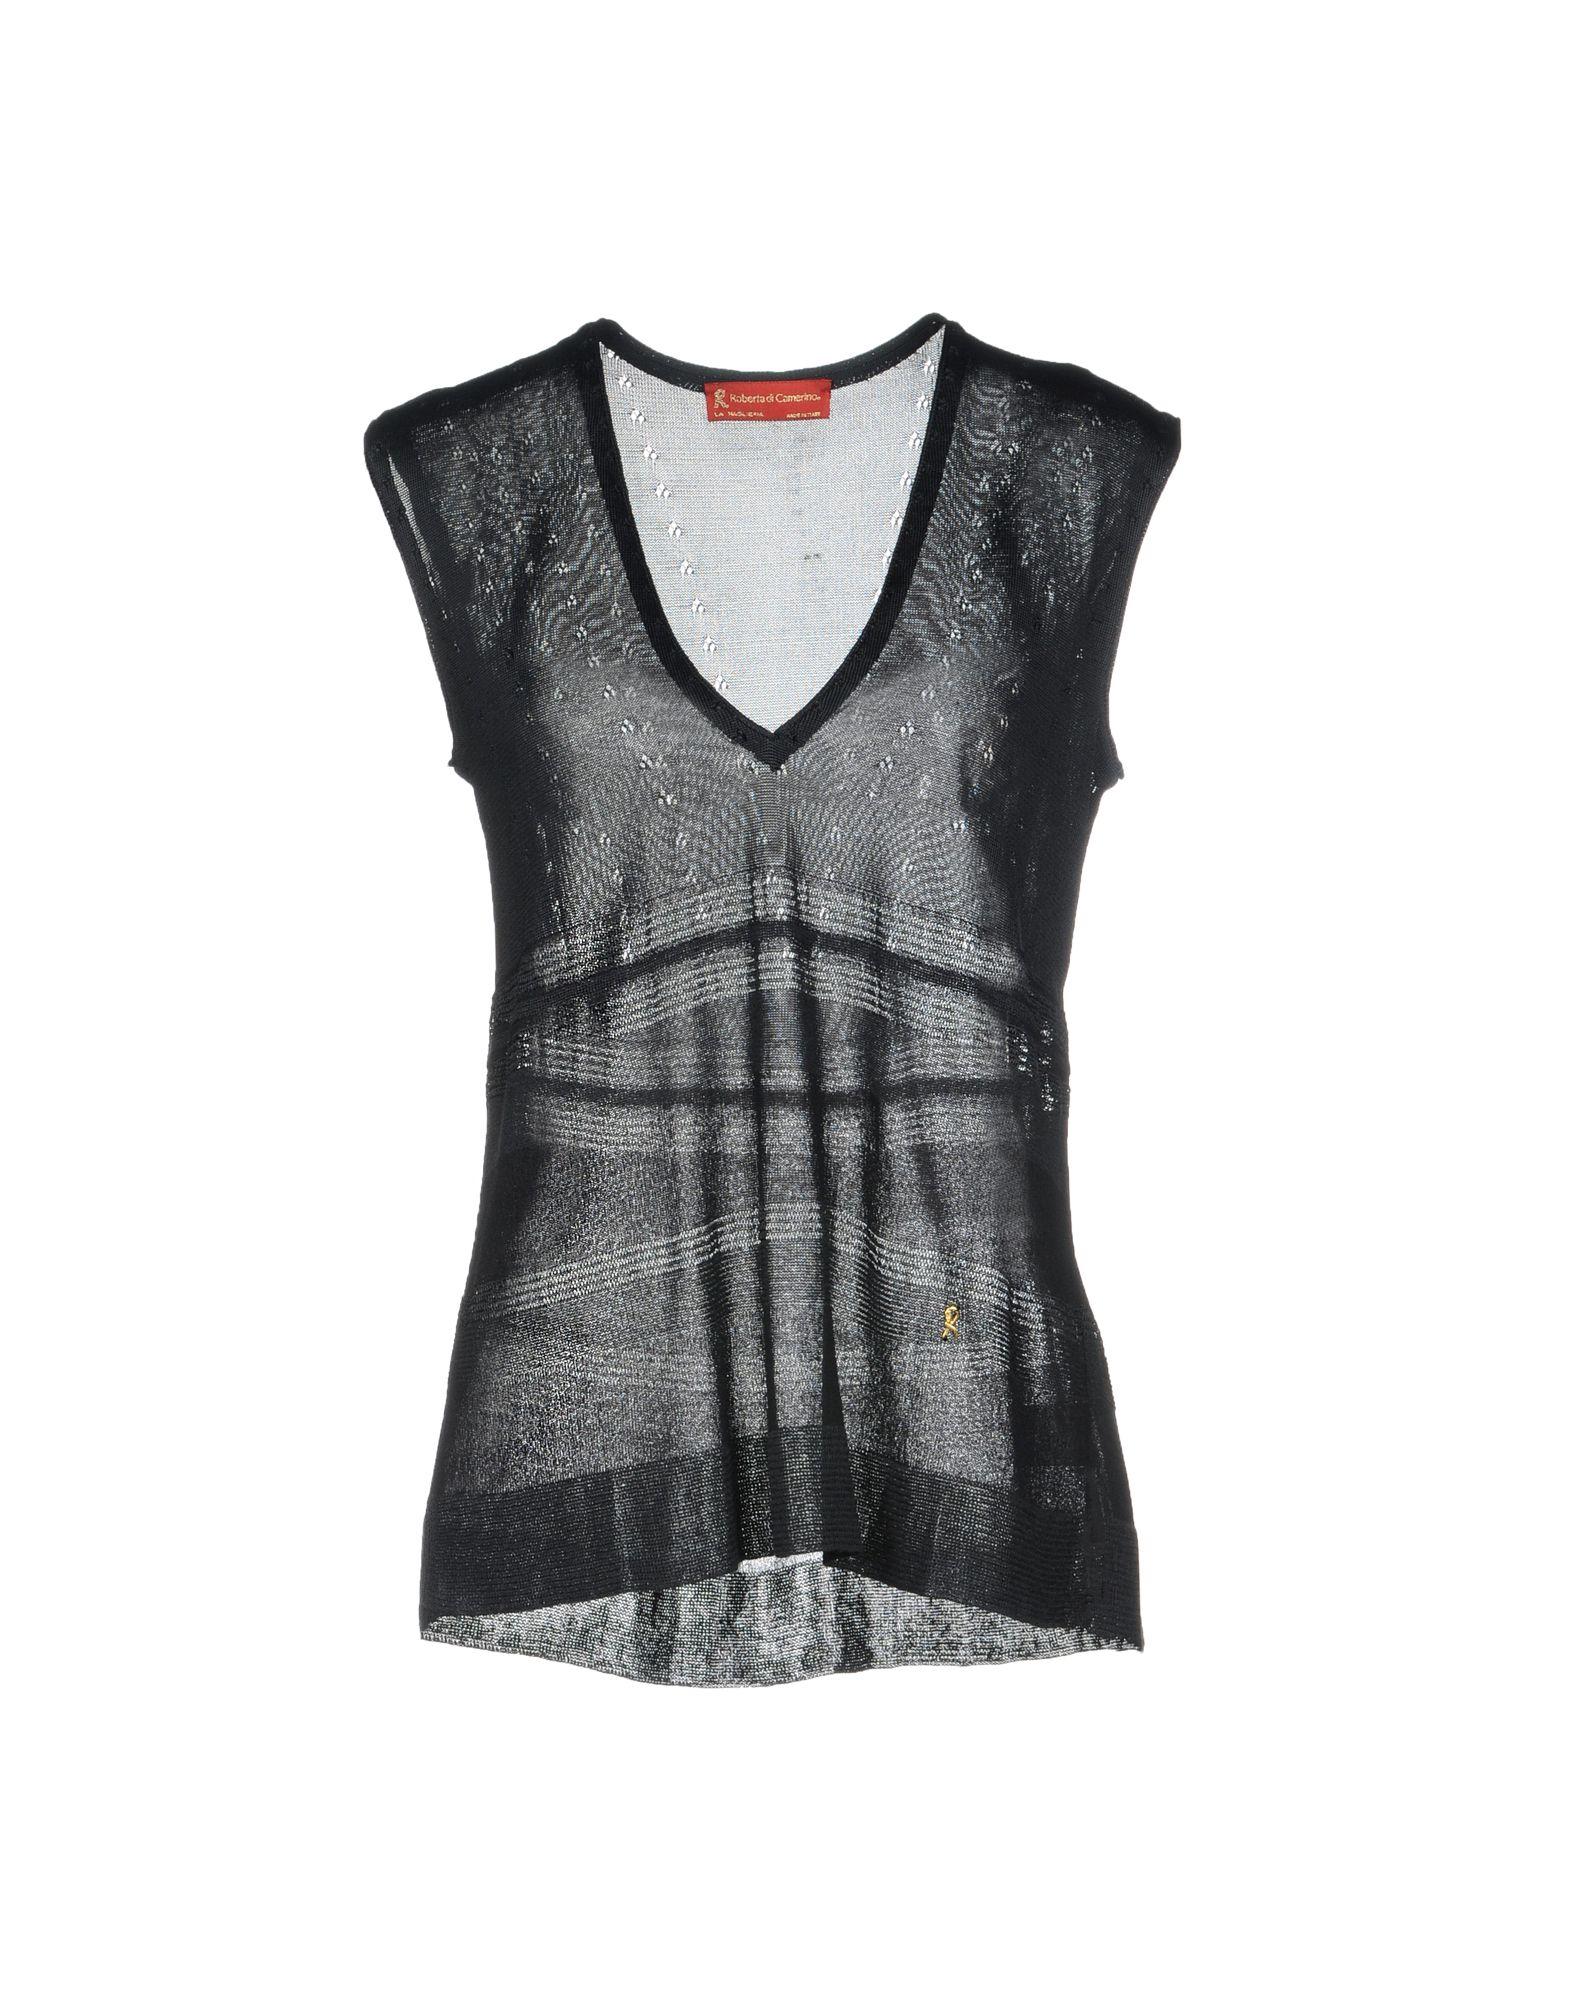 ROBERTA DI CAMERINO Sweater in Black